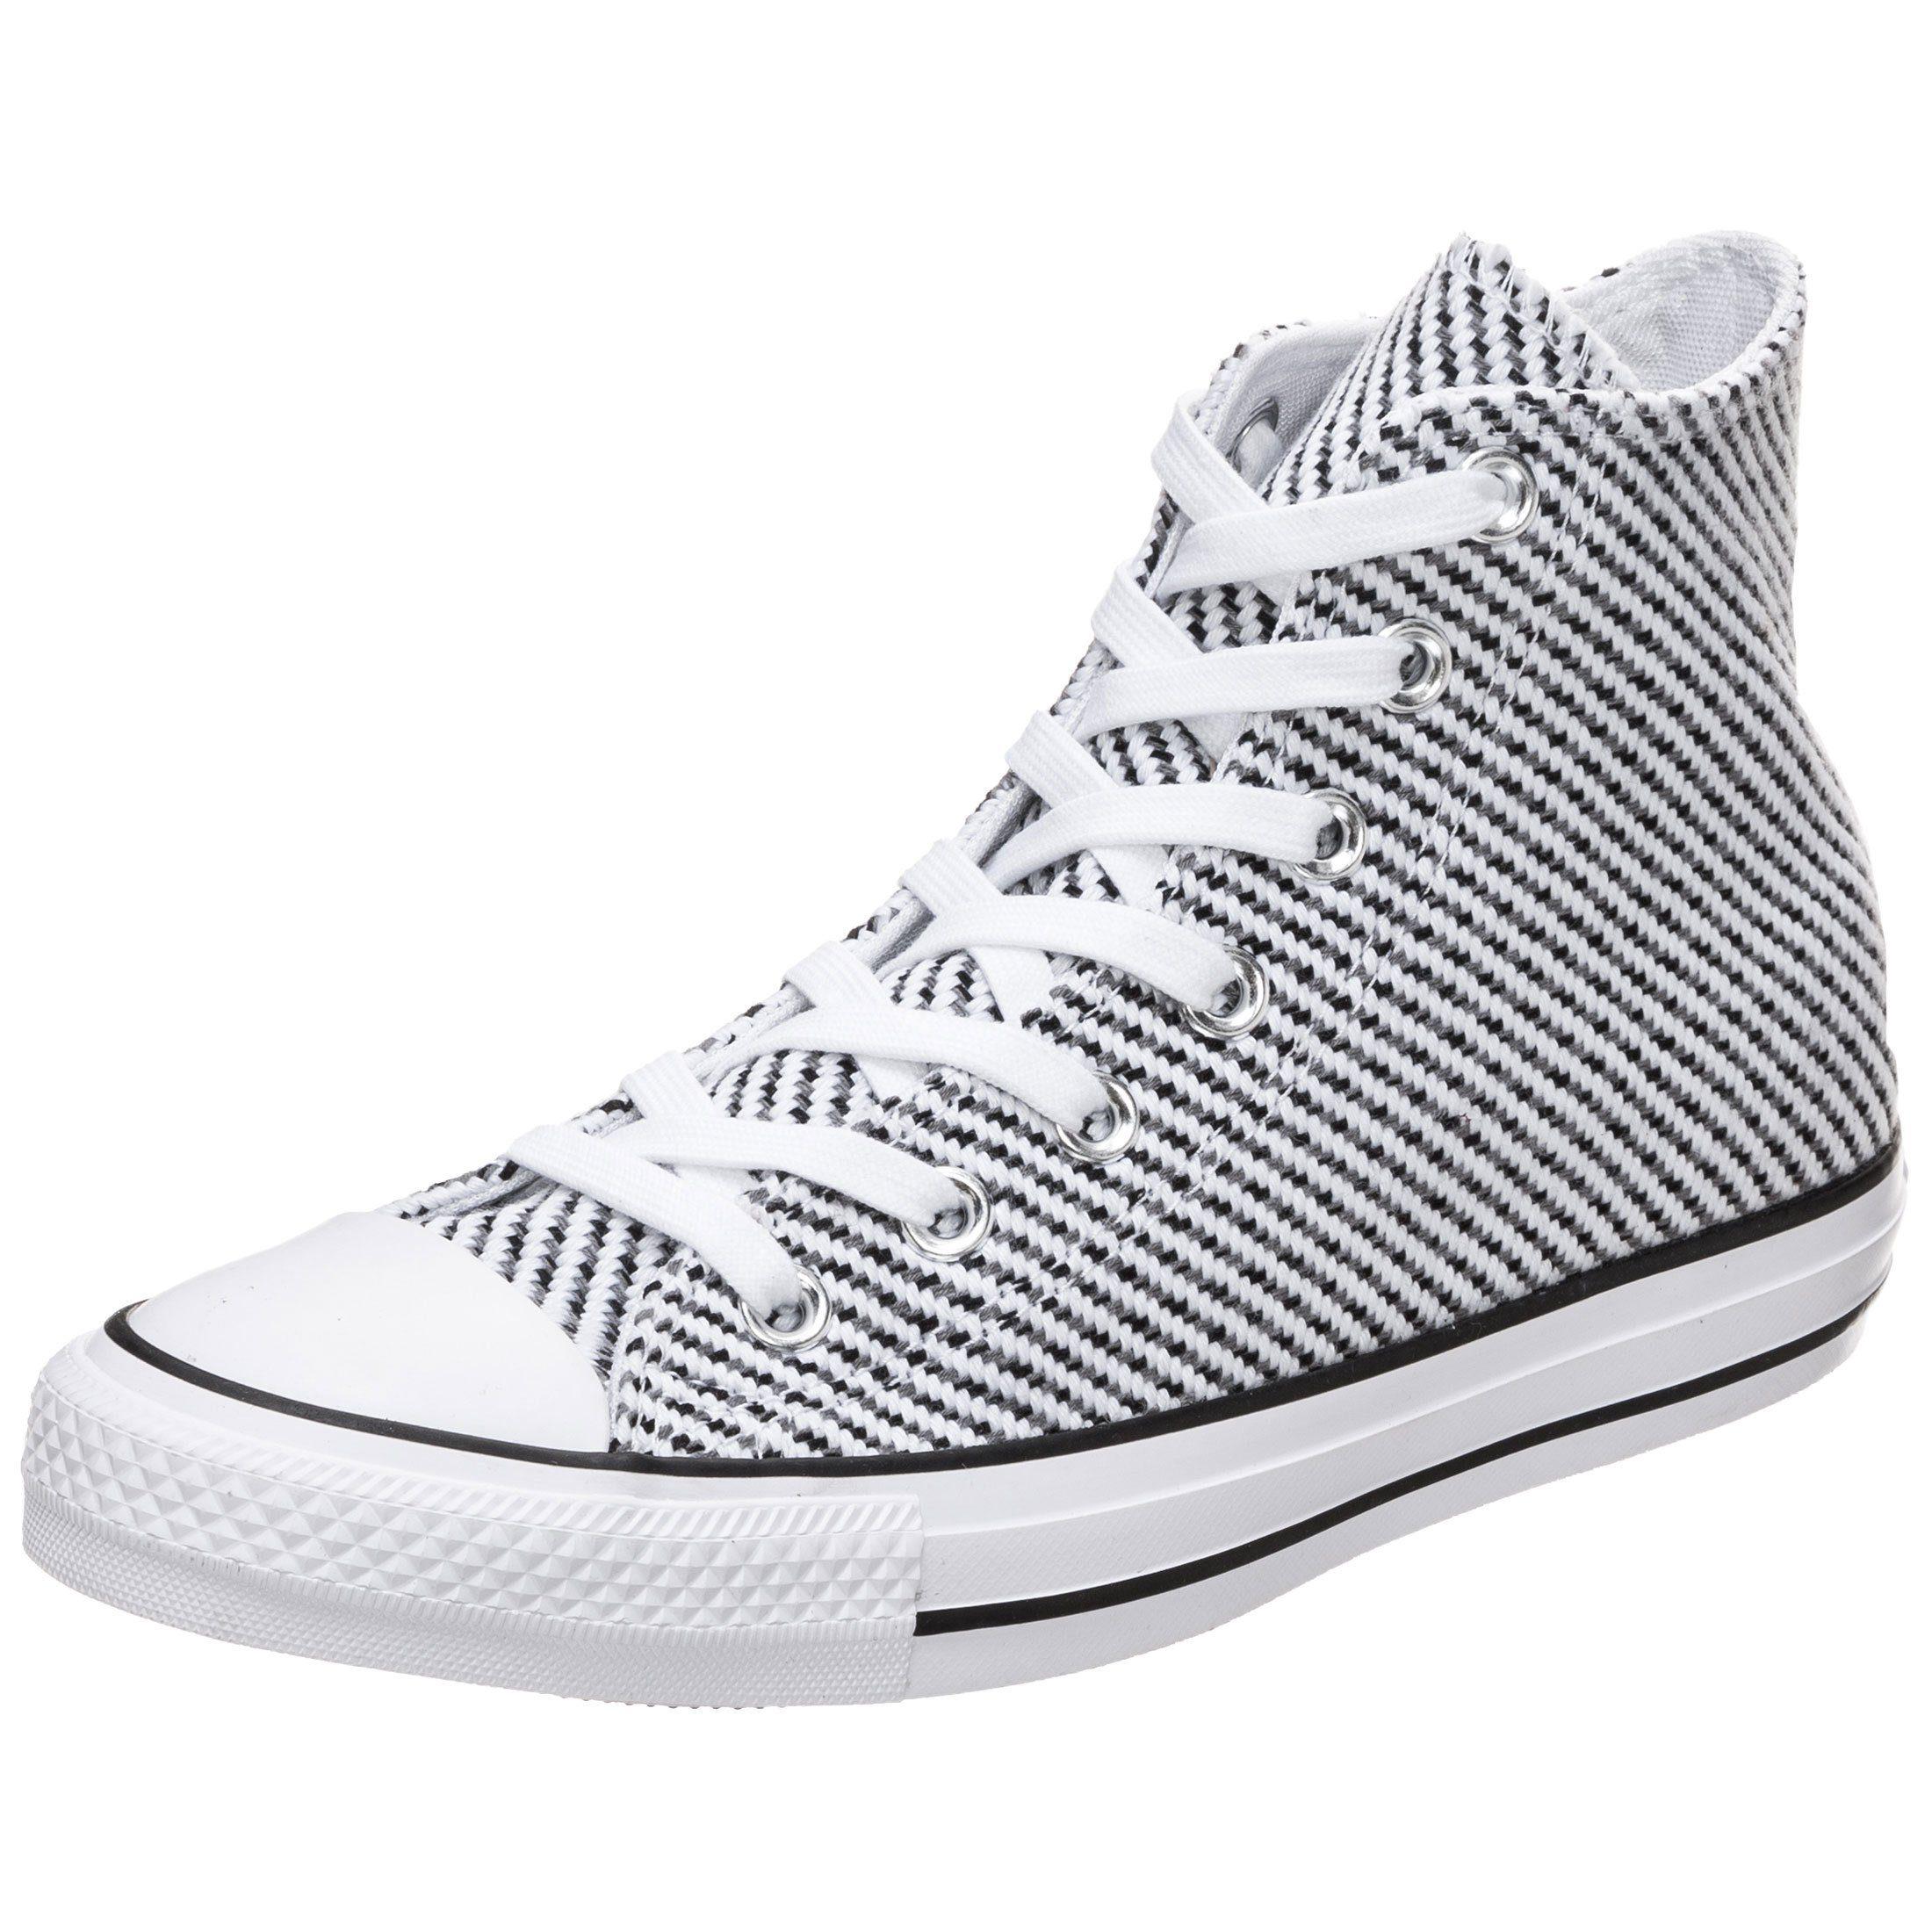 69f30c3c0cd3ac Converse Sneaker »Chuck Taylor All Star High« günstig kaufen